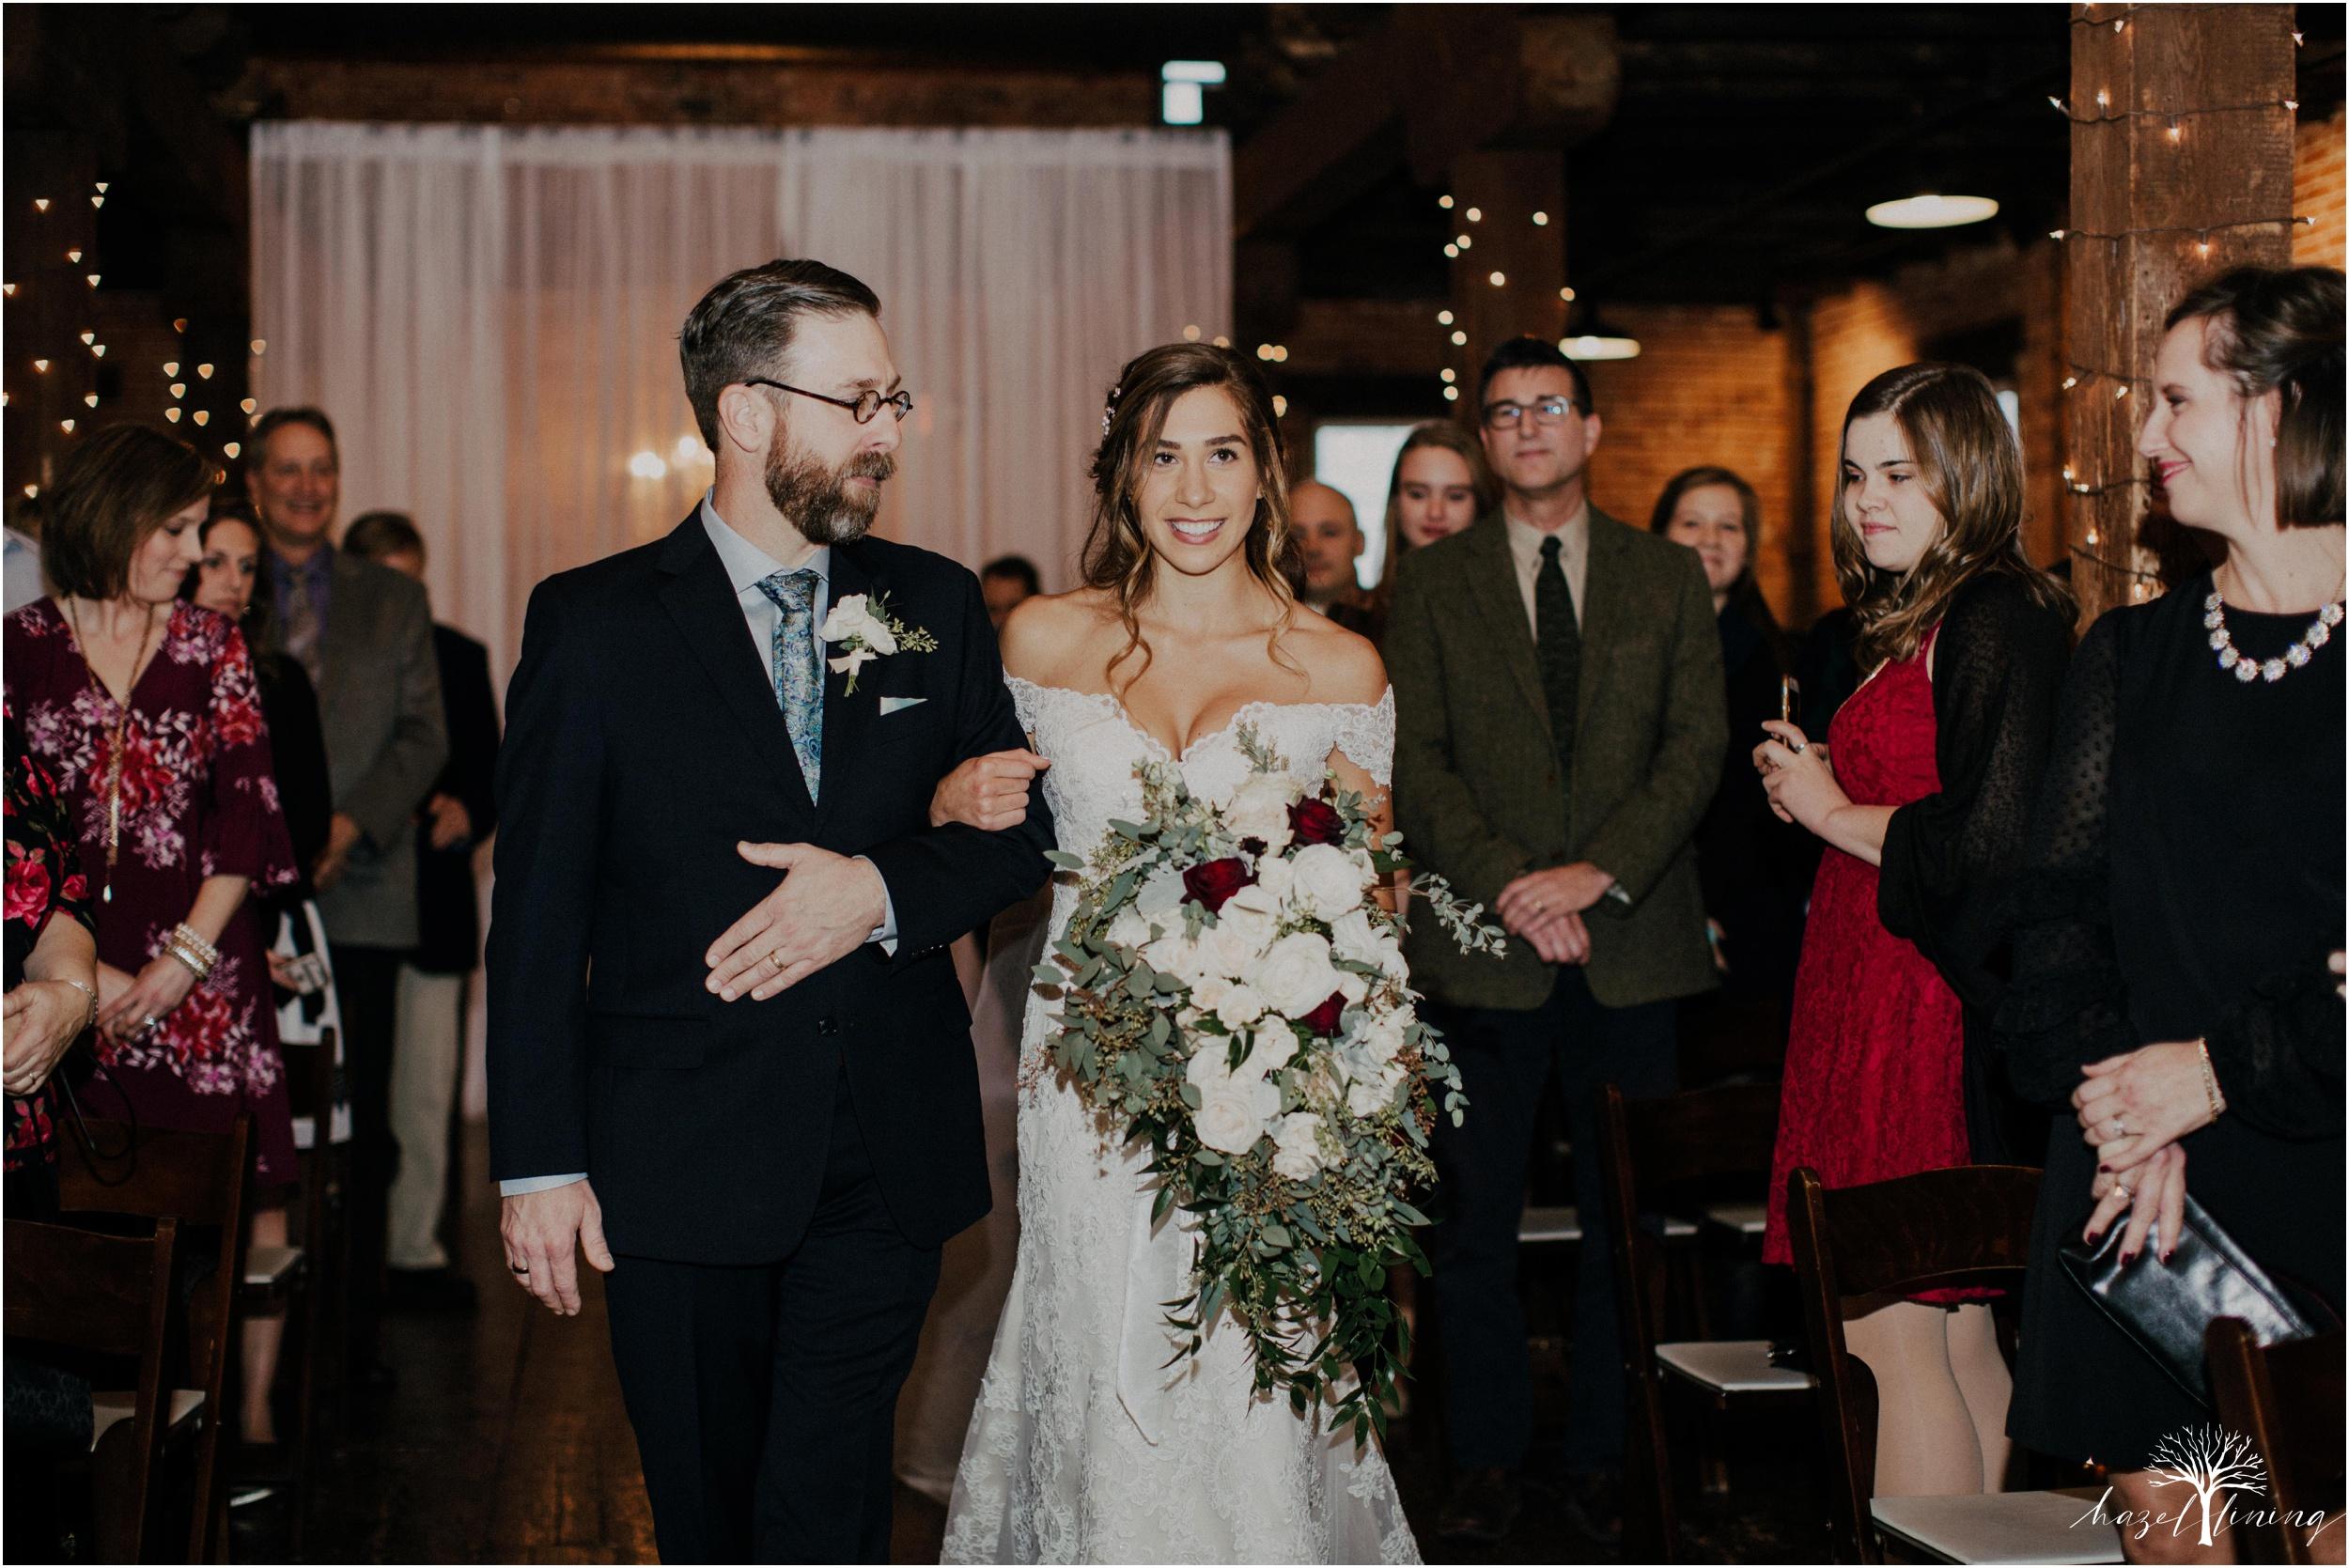 emma-matt-gehringer-the-booking-house-lancaster-manhiem-pennsylvania-winter-wedding_0050.jpg